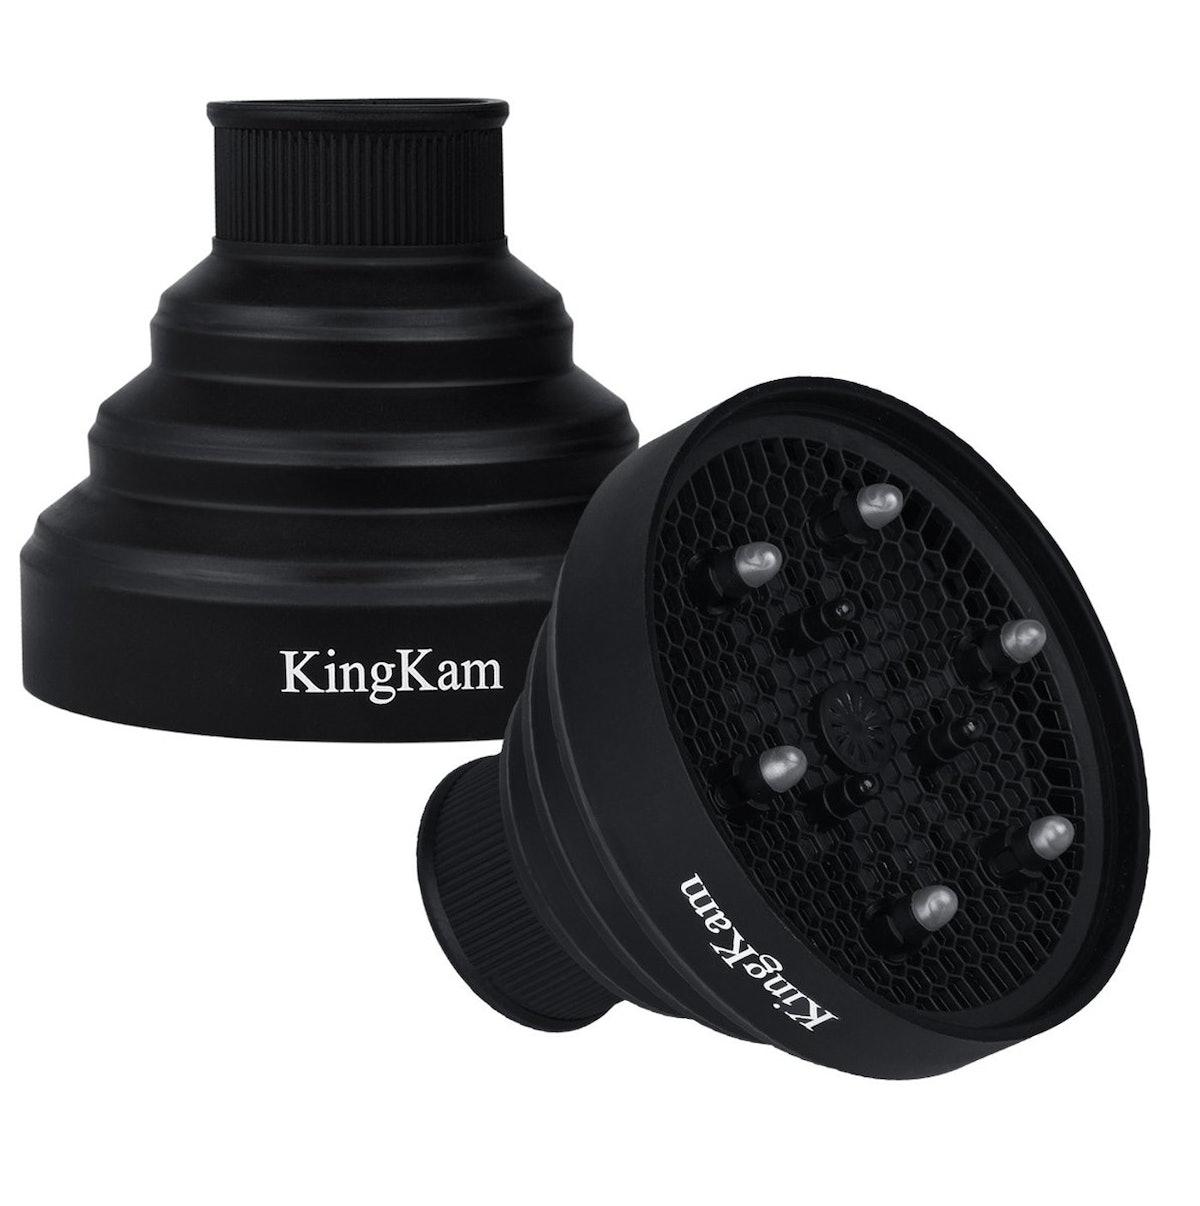 KingKam Universal Collapsible Hair Diffuser